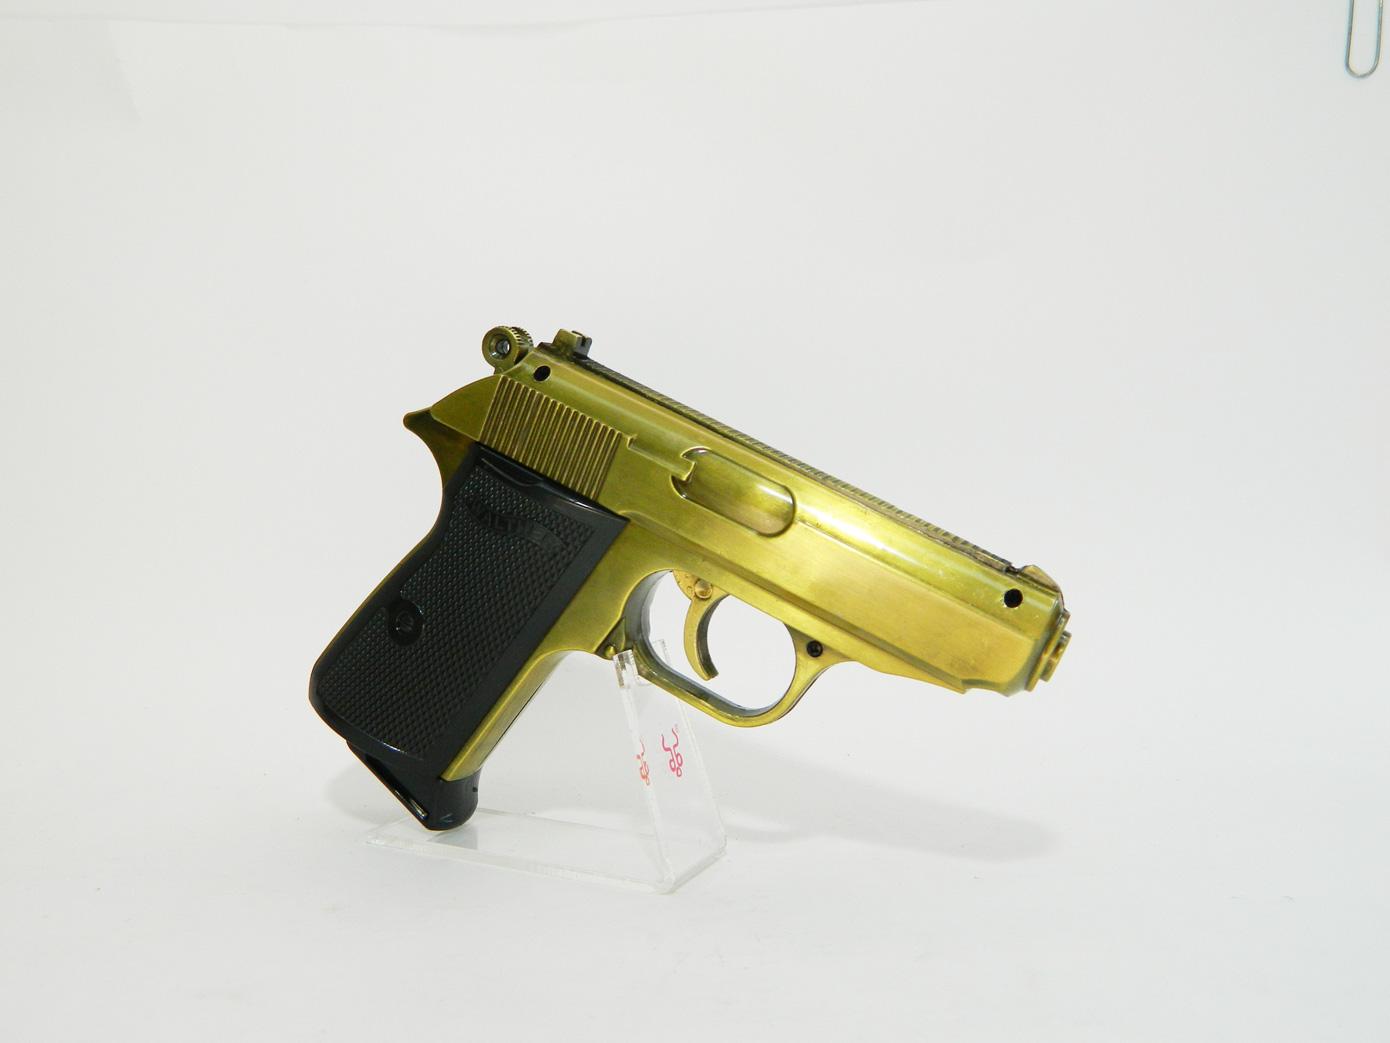 Пистолет Walther PPK/S бронза изображение 1